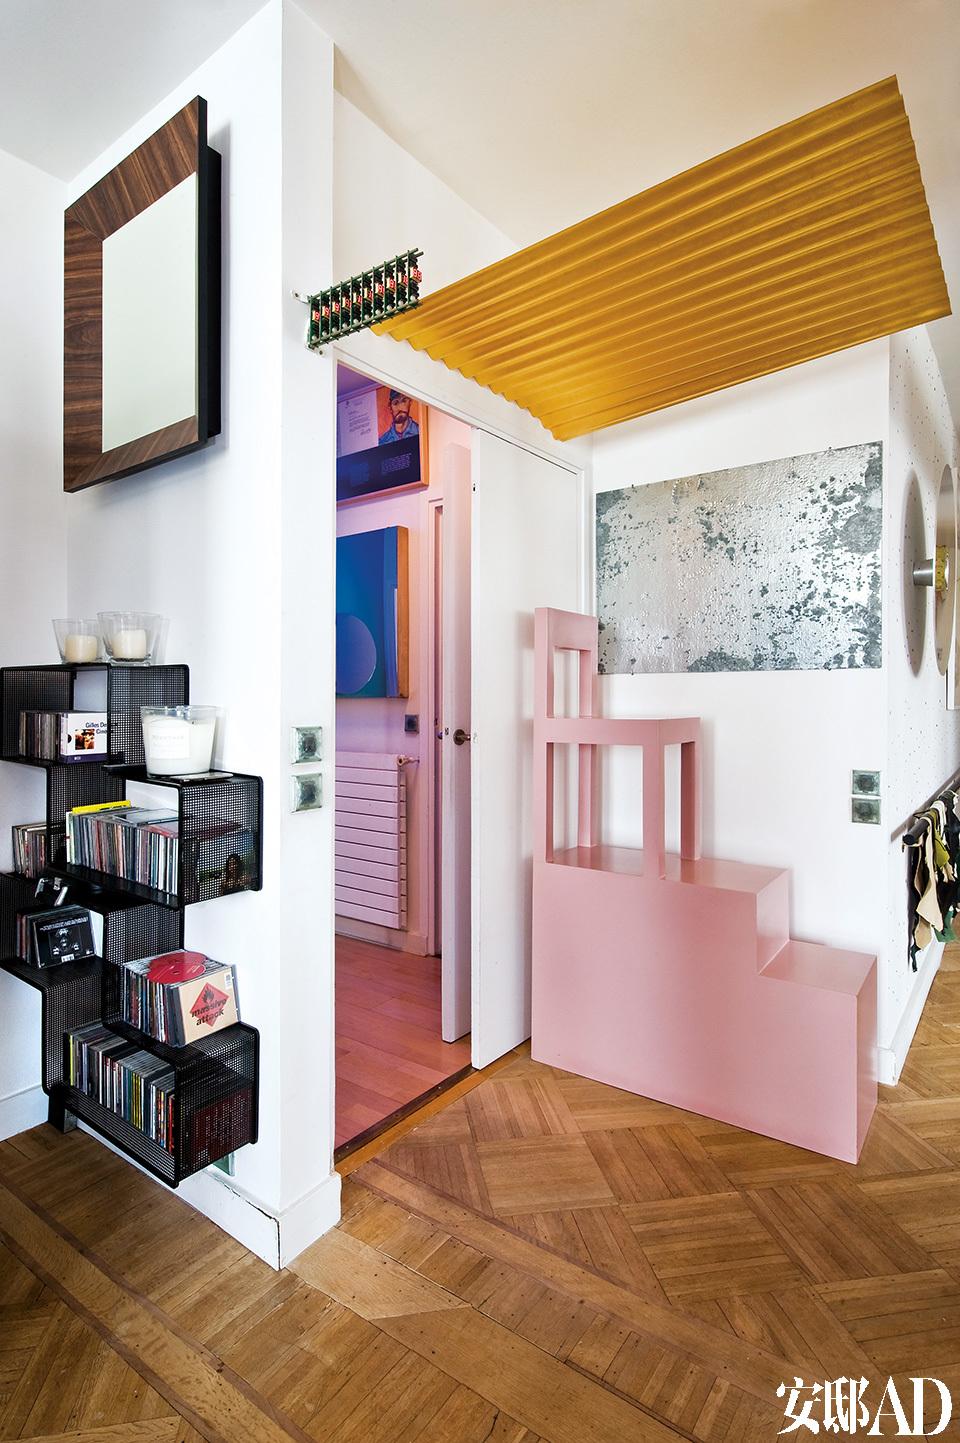 Mathieu Mategot设计的搁架储放着主人的CD,上方悬挂的墙饰来自Richard Artschwager,阶梯形状的粉色椅子由Alessandro Mendini设计,门上的波状金箔来自设计师Ann VeronicaJanssens,墙上银色的艺术品是一幅Franck David创作的拼图。